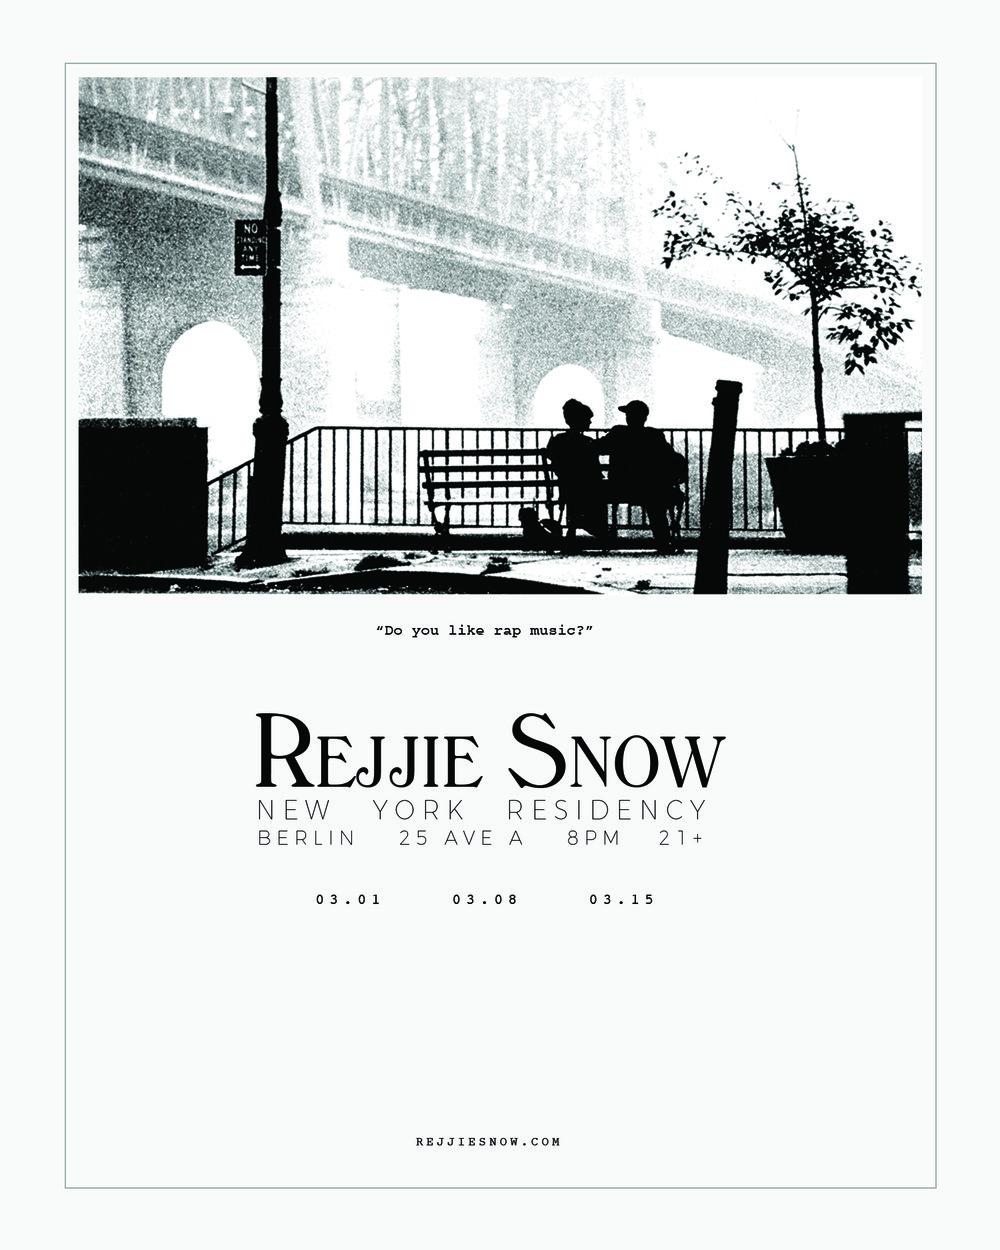 Rejjie Snow NYC Residency - March 2017